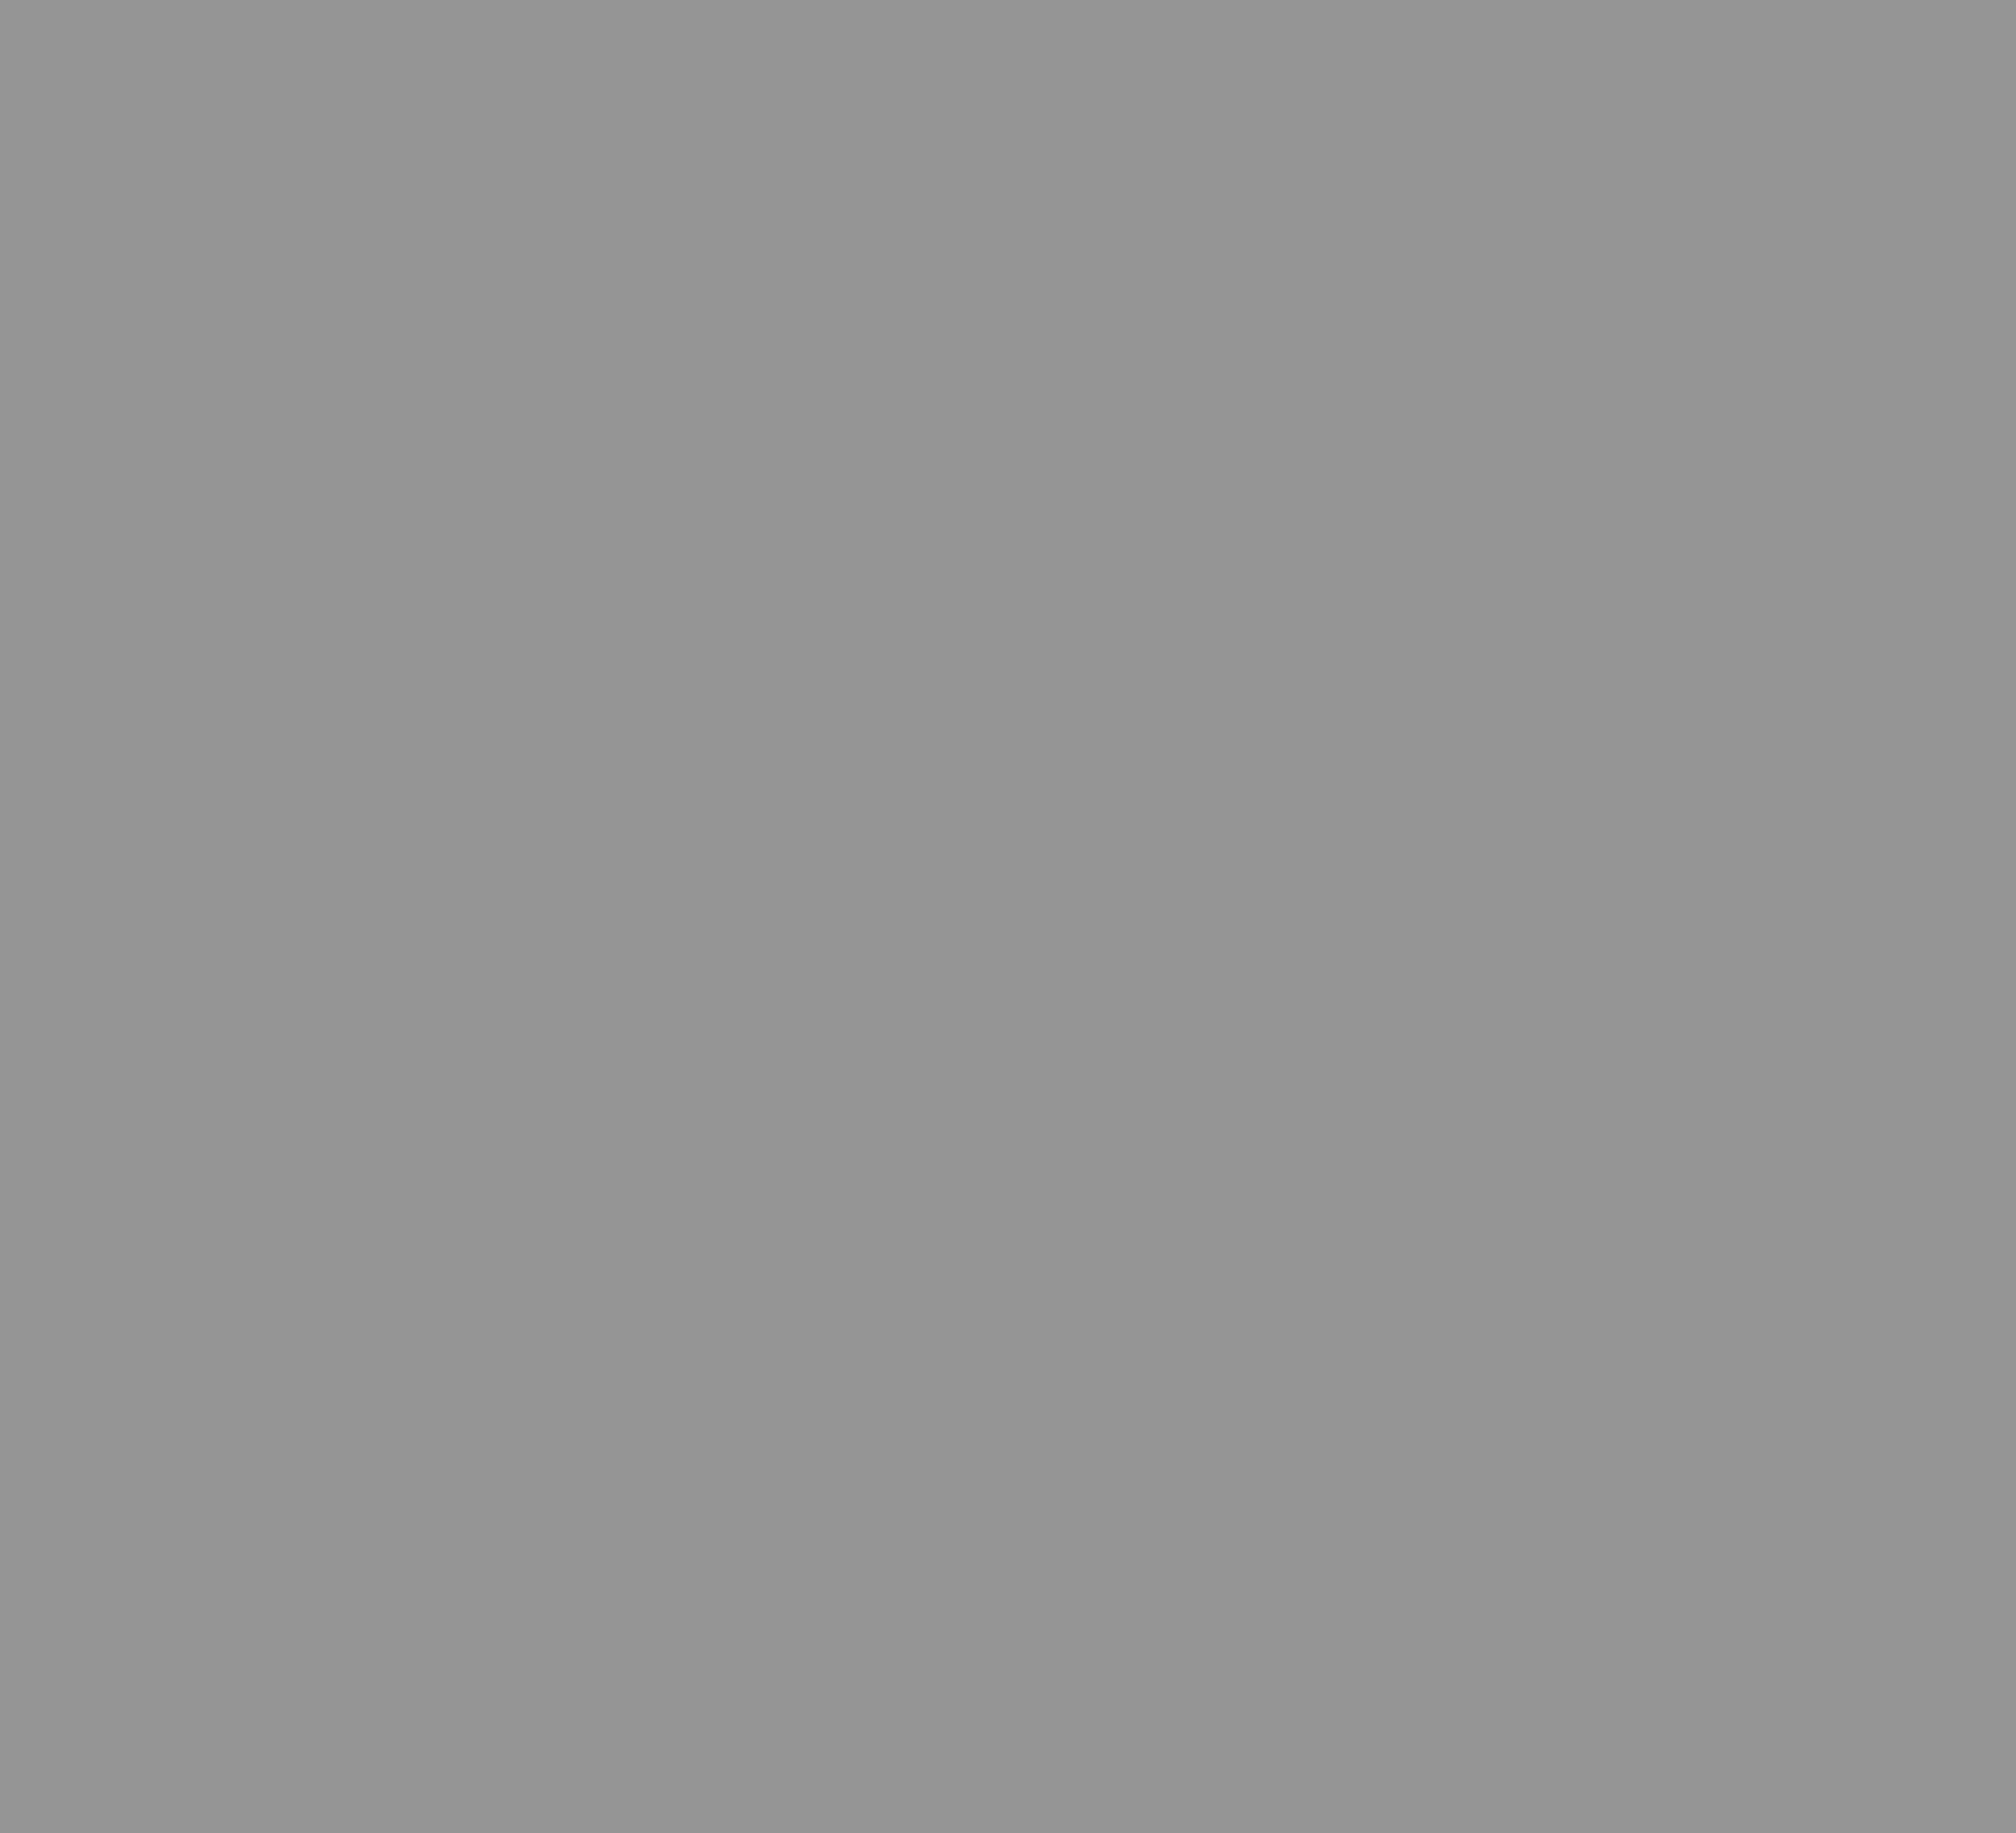 61 Light Grey Background